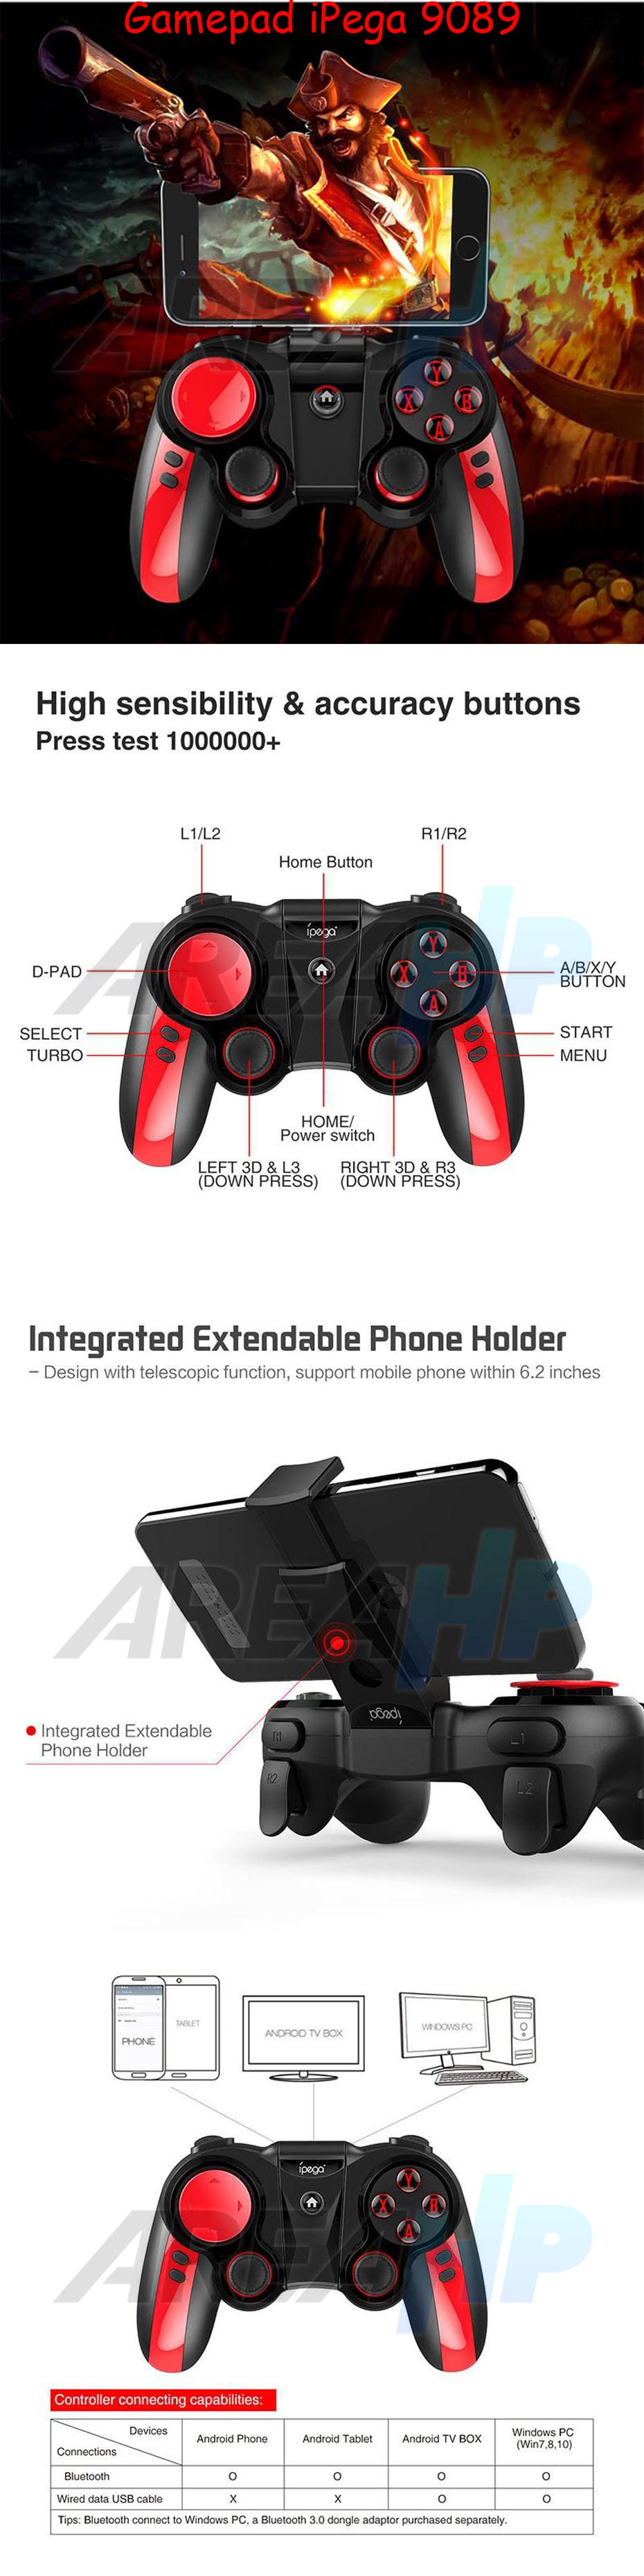 Ipega Gamepad PG-9089 Overview